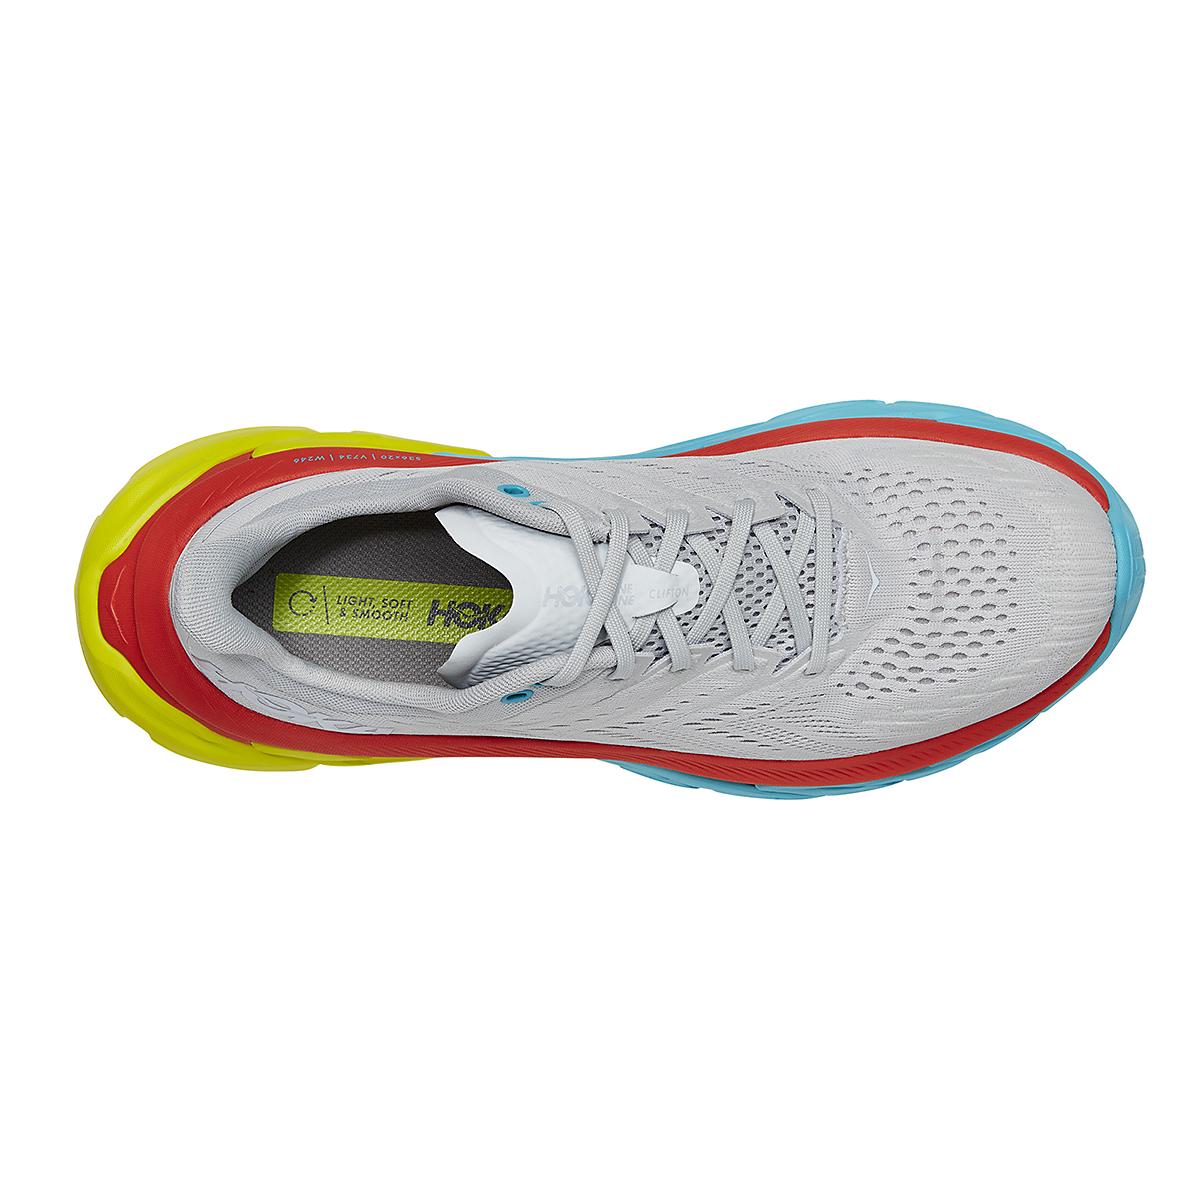 Men's Hoka One One Clifton Edge Running Shoe - Color: Lunar Rock/White - Size: 8.5 - Width: Regular, Lunar Rock/White, large, image 3